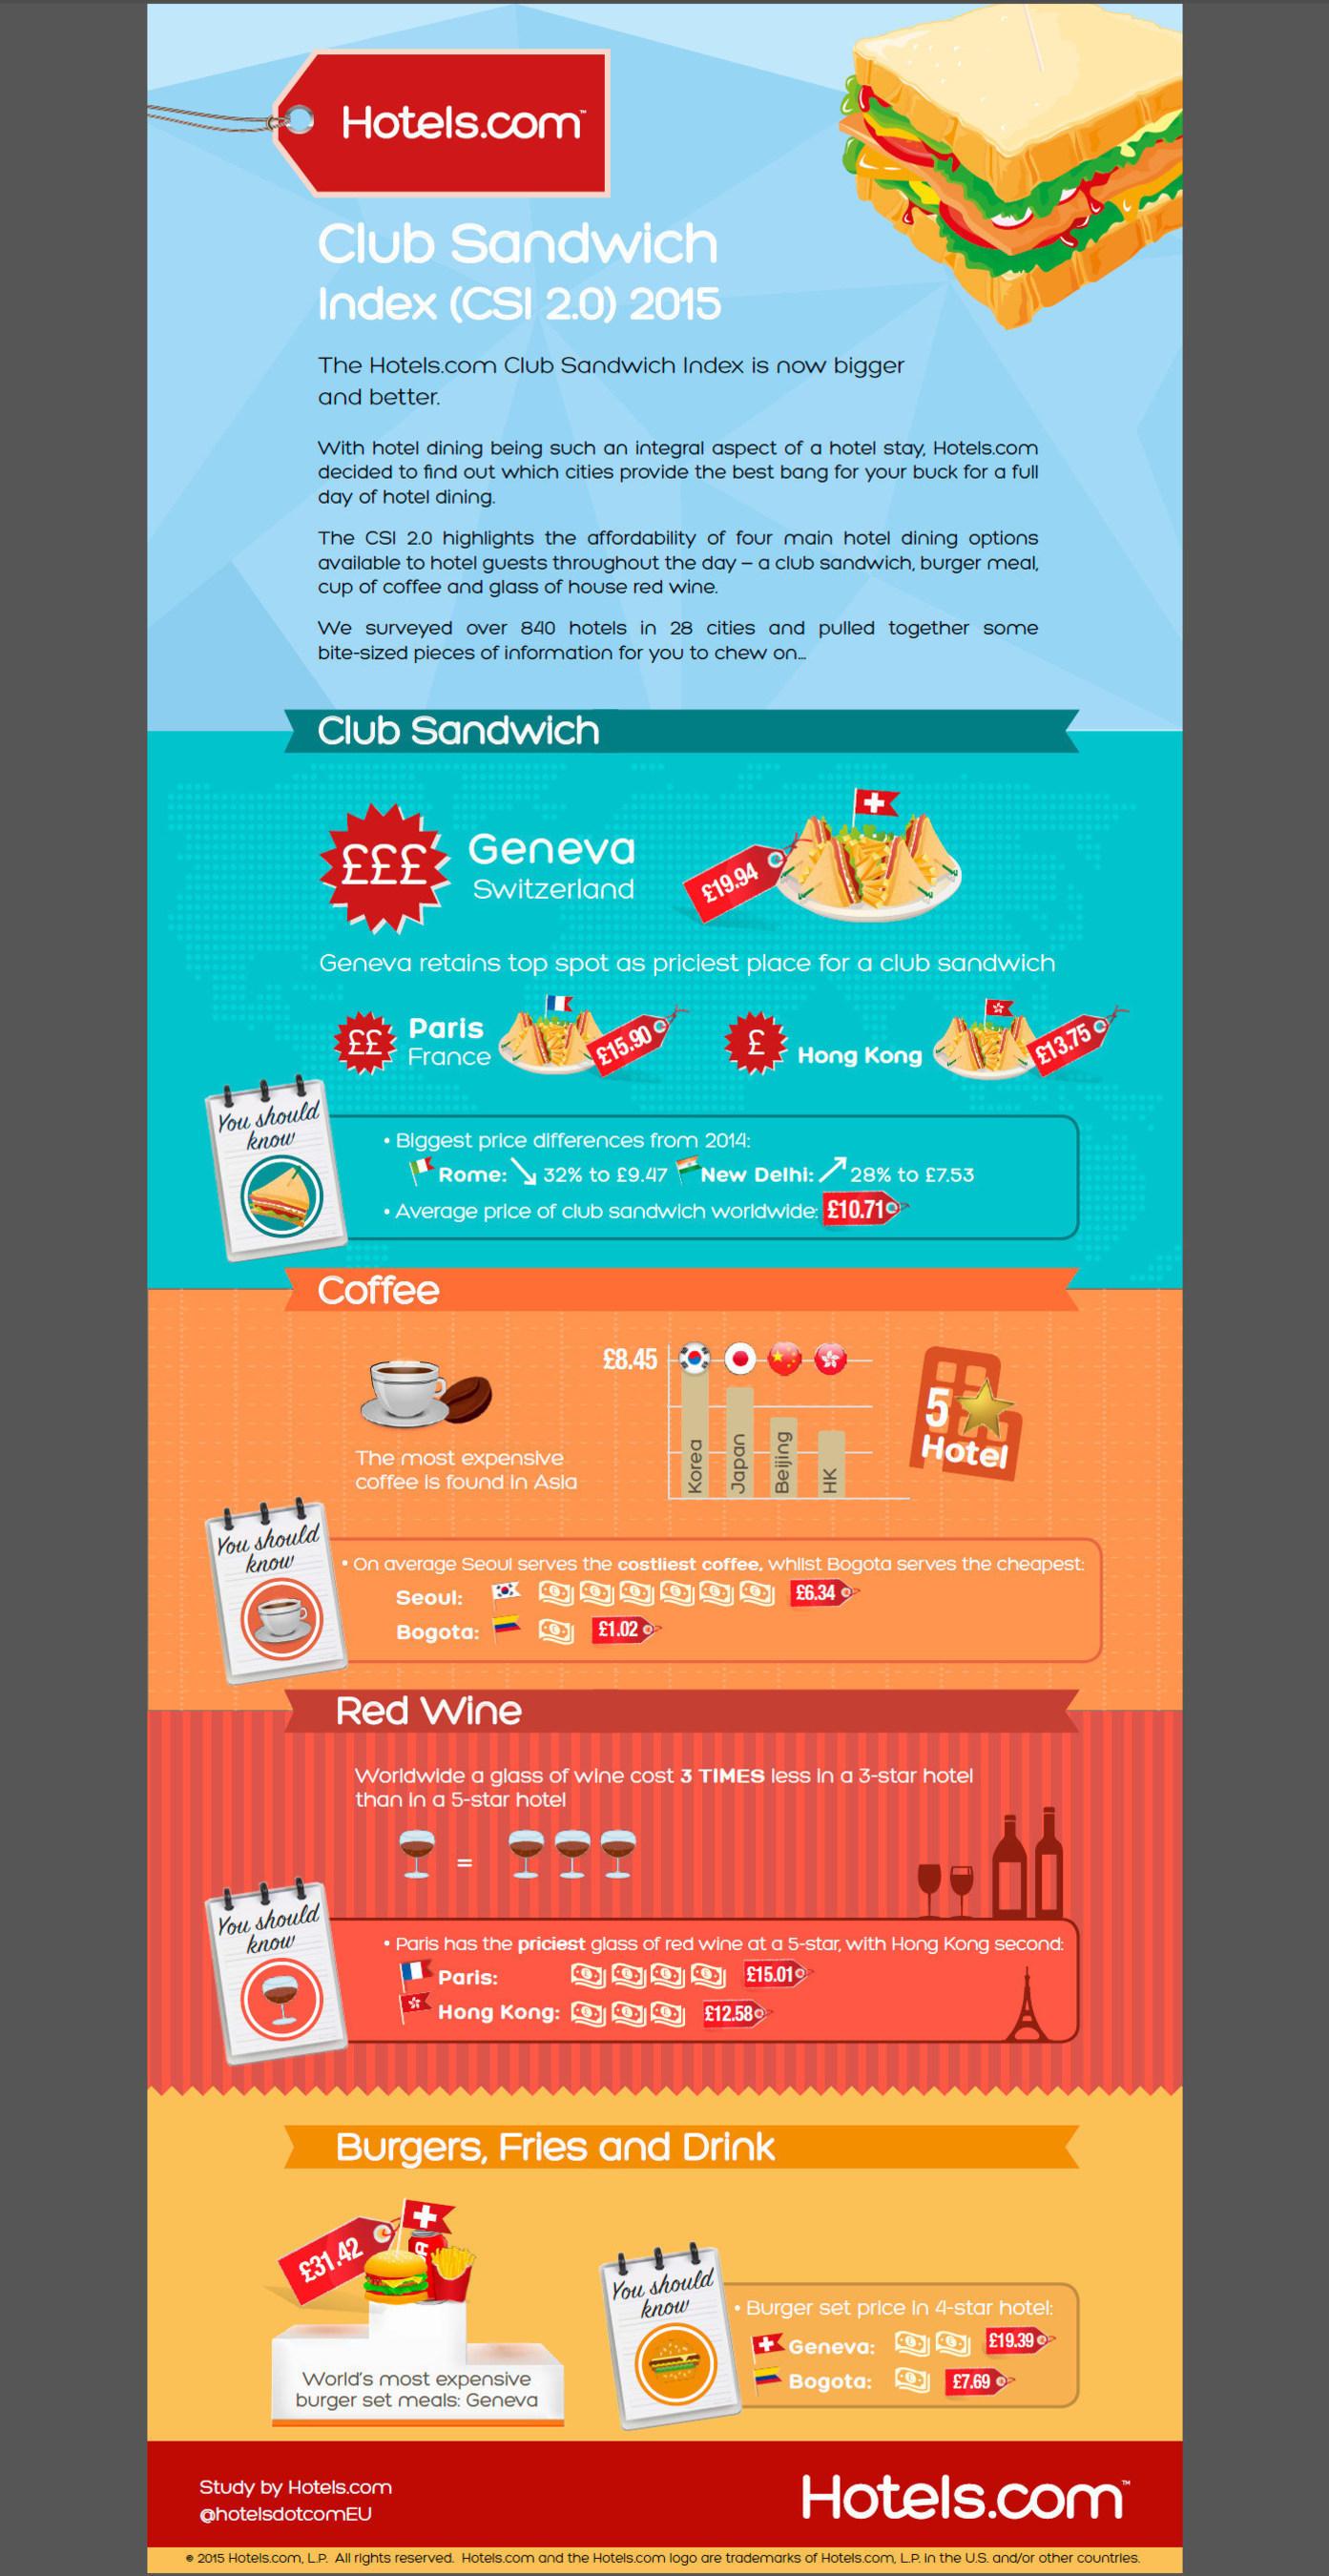 Club Sandwich Index 2015 (PRNewsFoto/Hotels.com) (PRNewsFoto/Hotels.com)